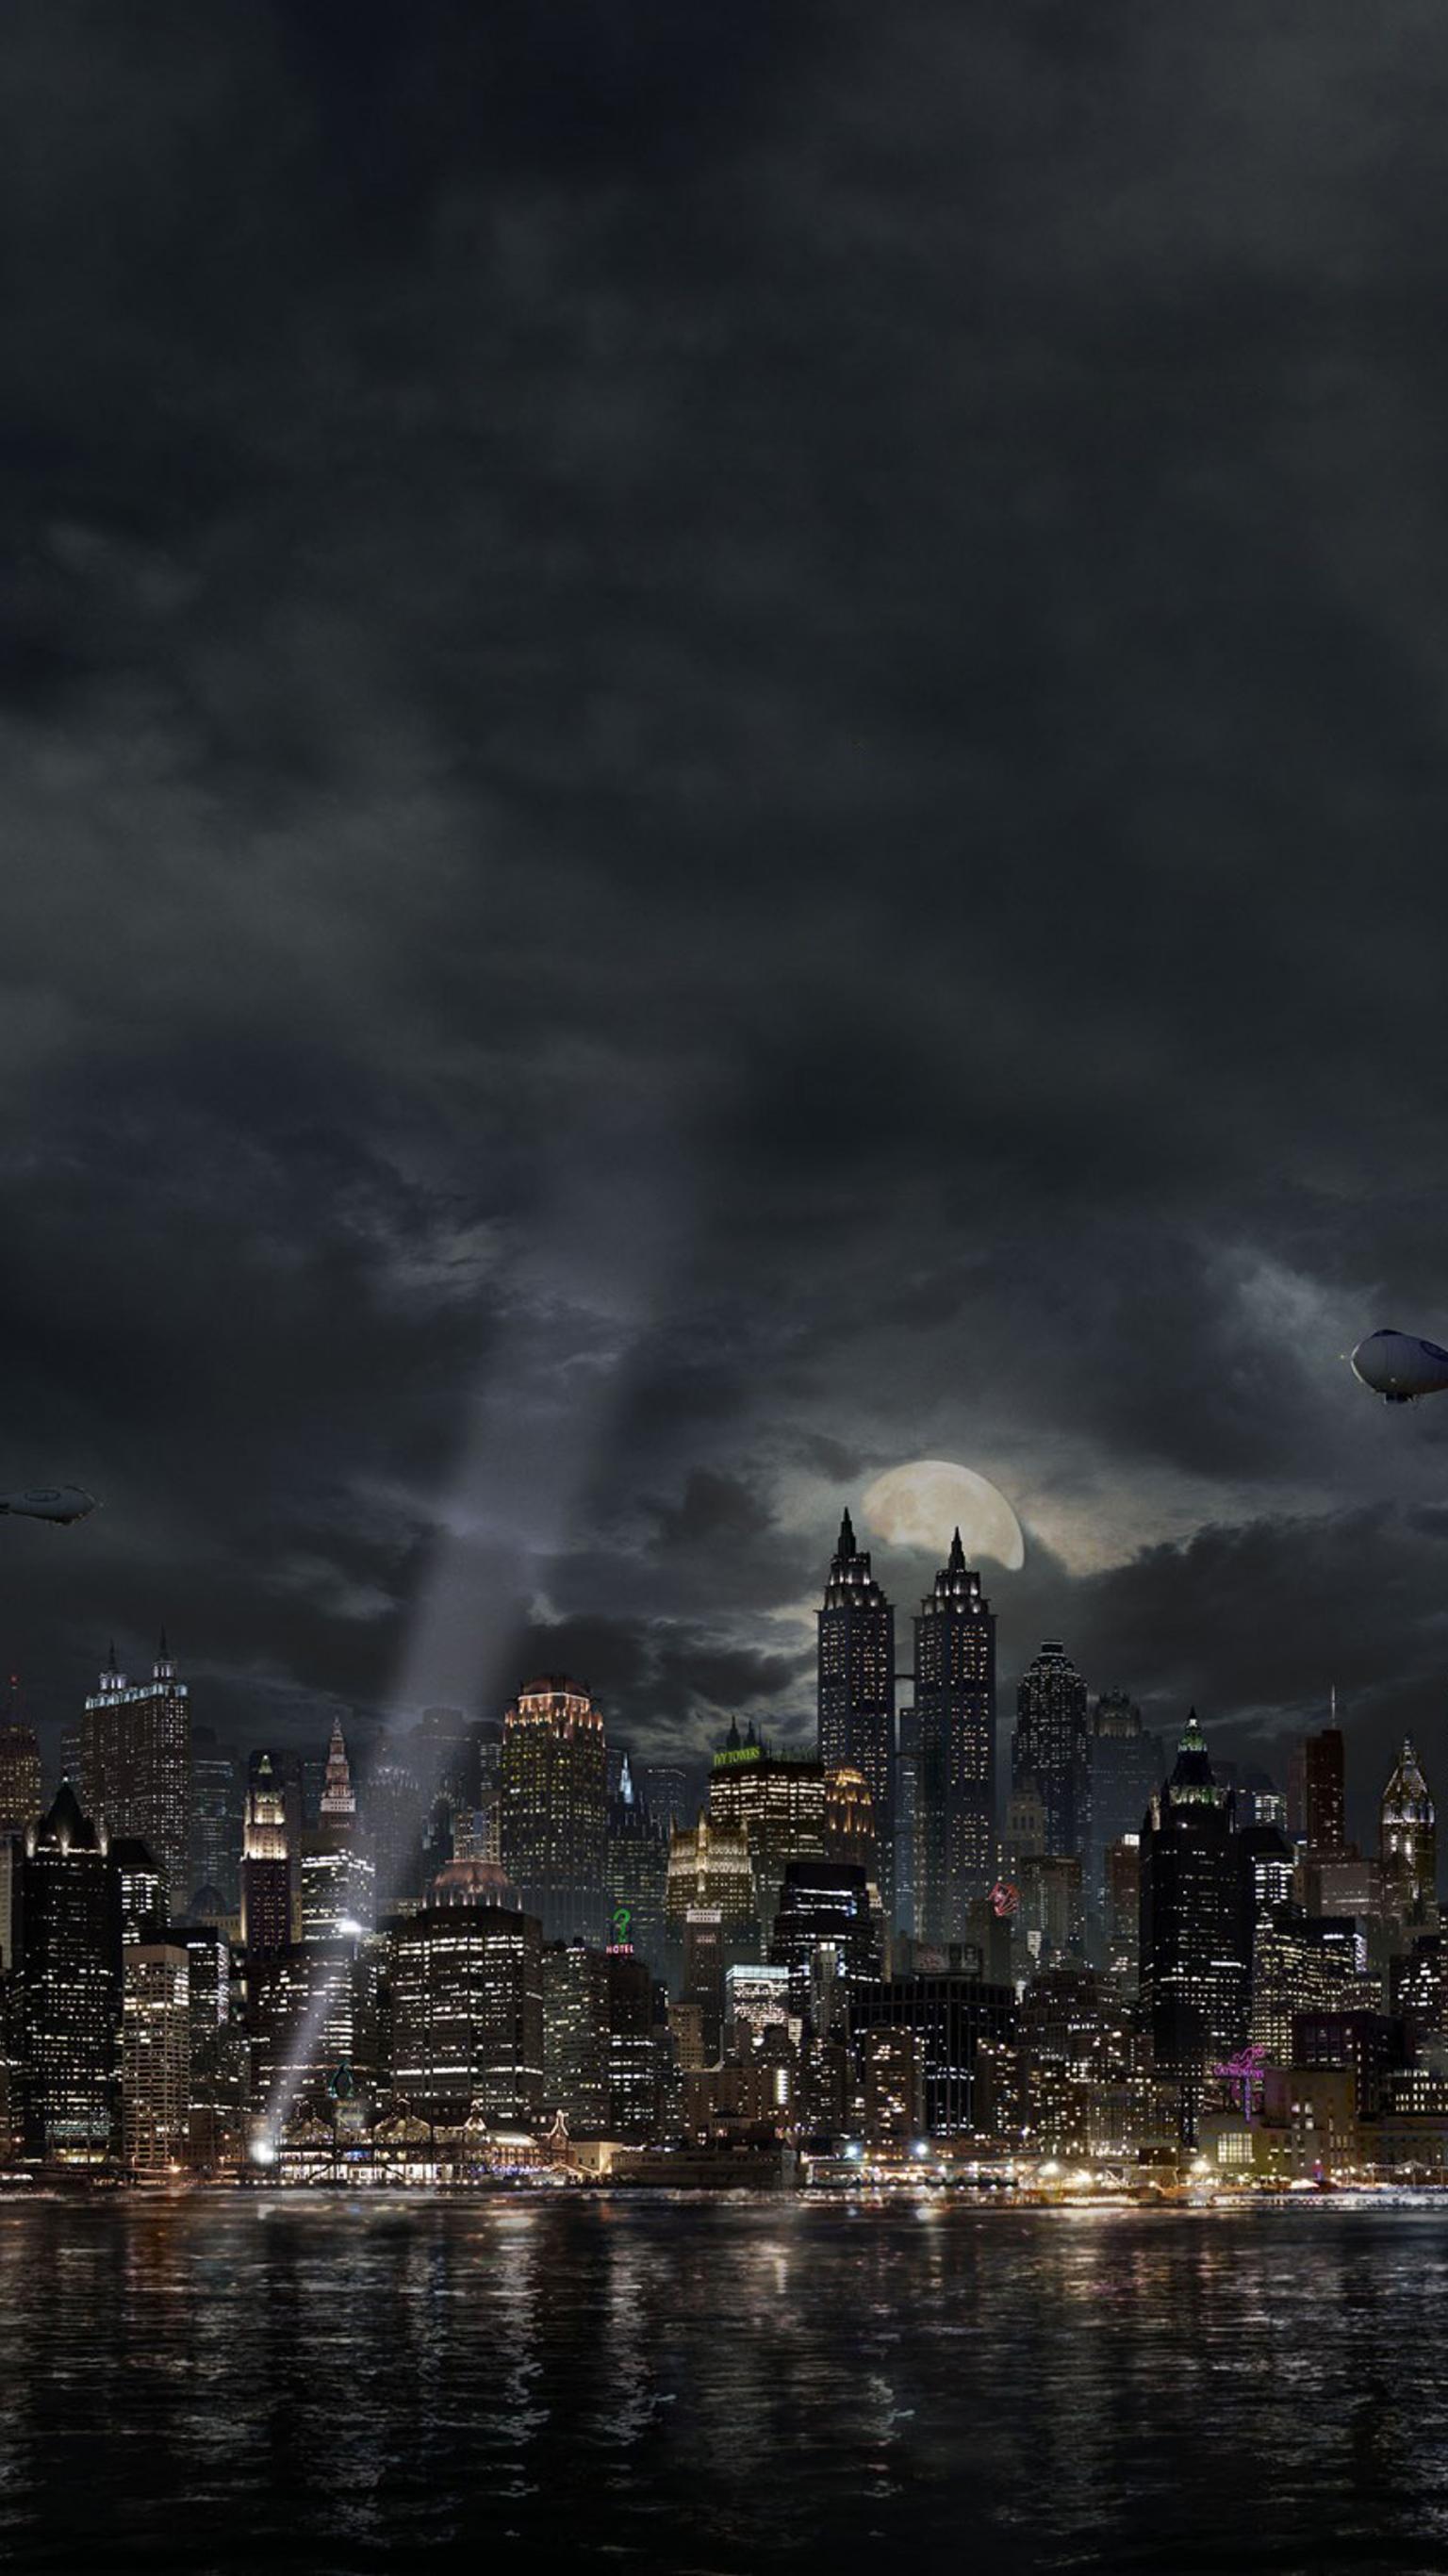 Gotham Phone Wallpaper Moviemania 1536x2732